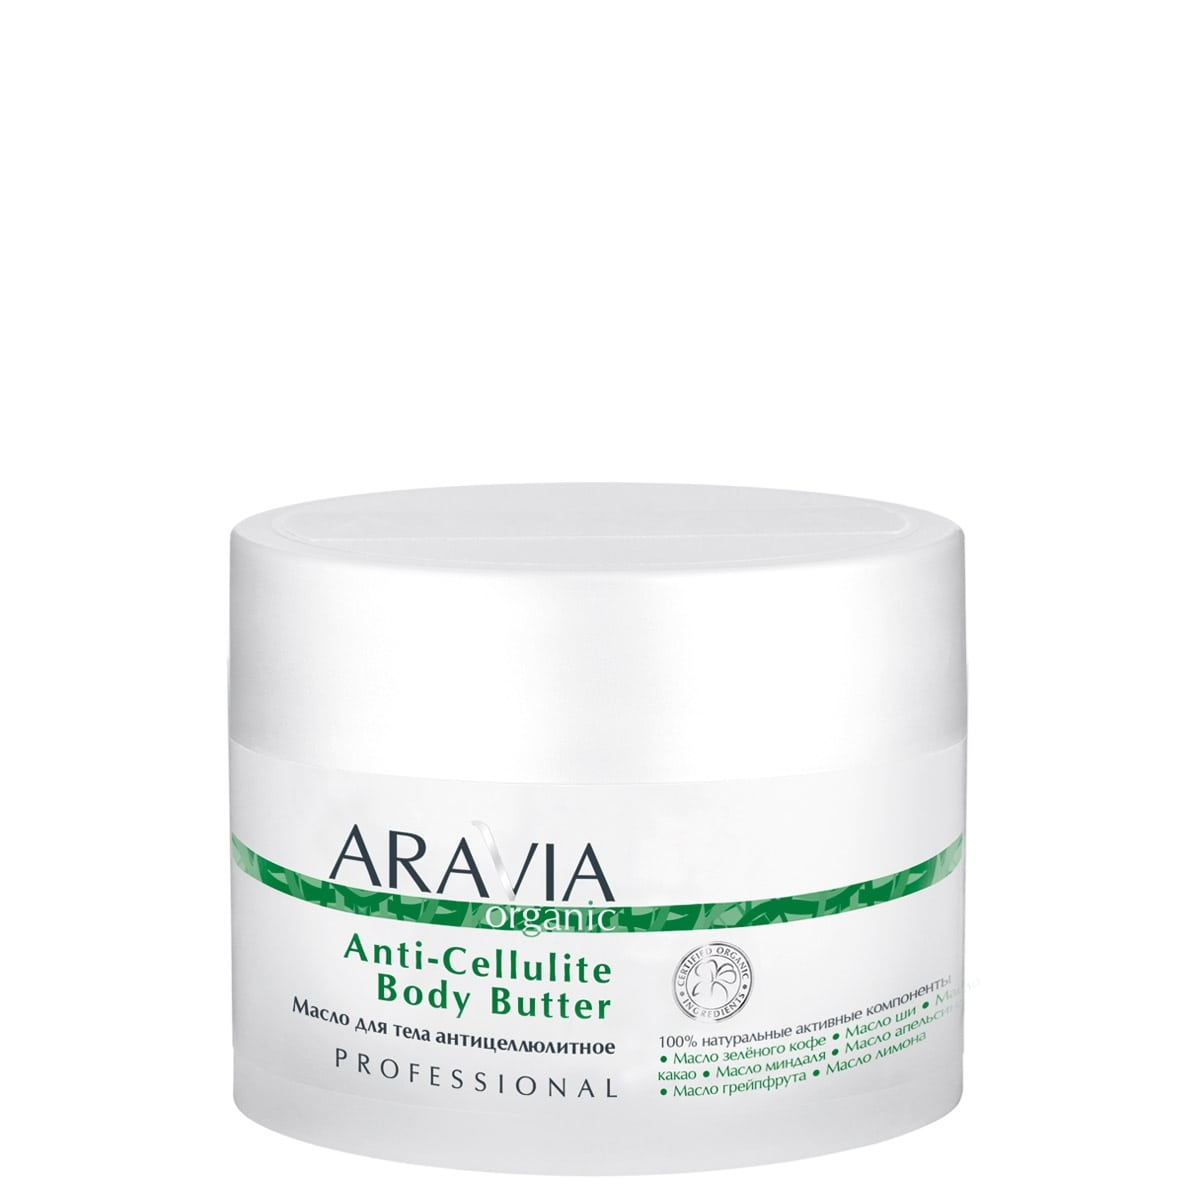 ARAVIA Organic Масло для Тела Антицеллюлитное Anti-Cellulite Body Butter, 150 мл